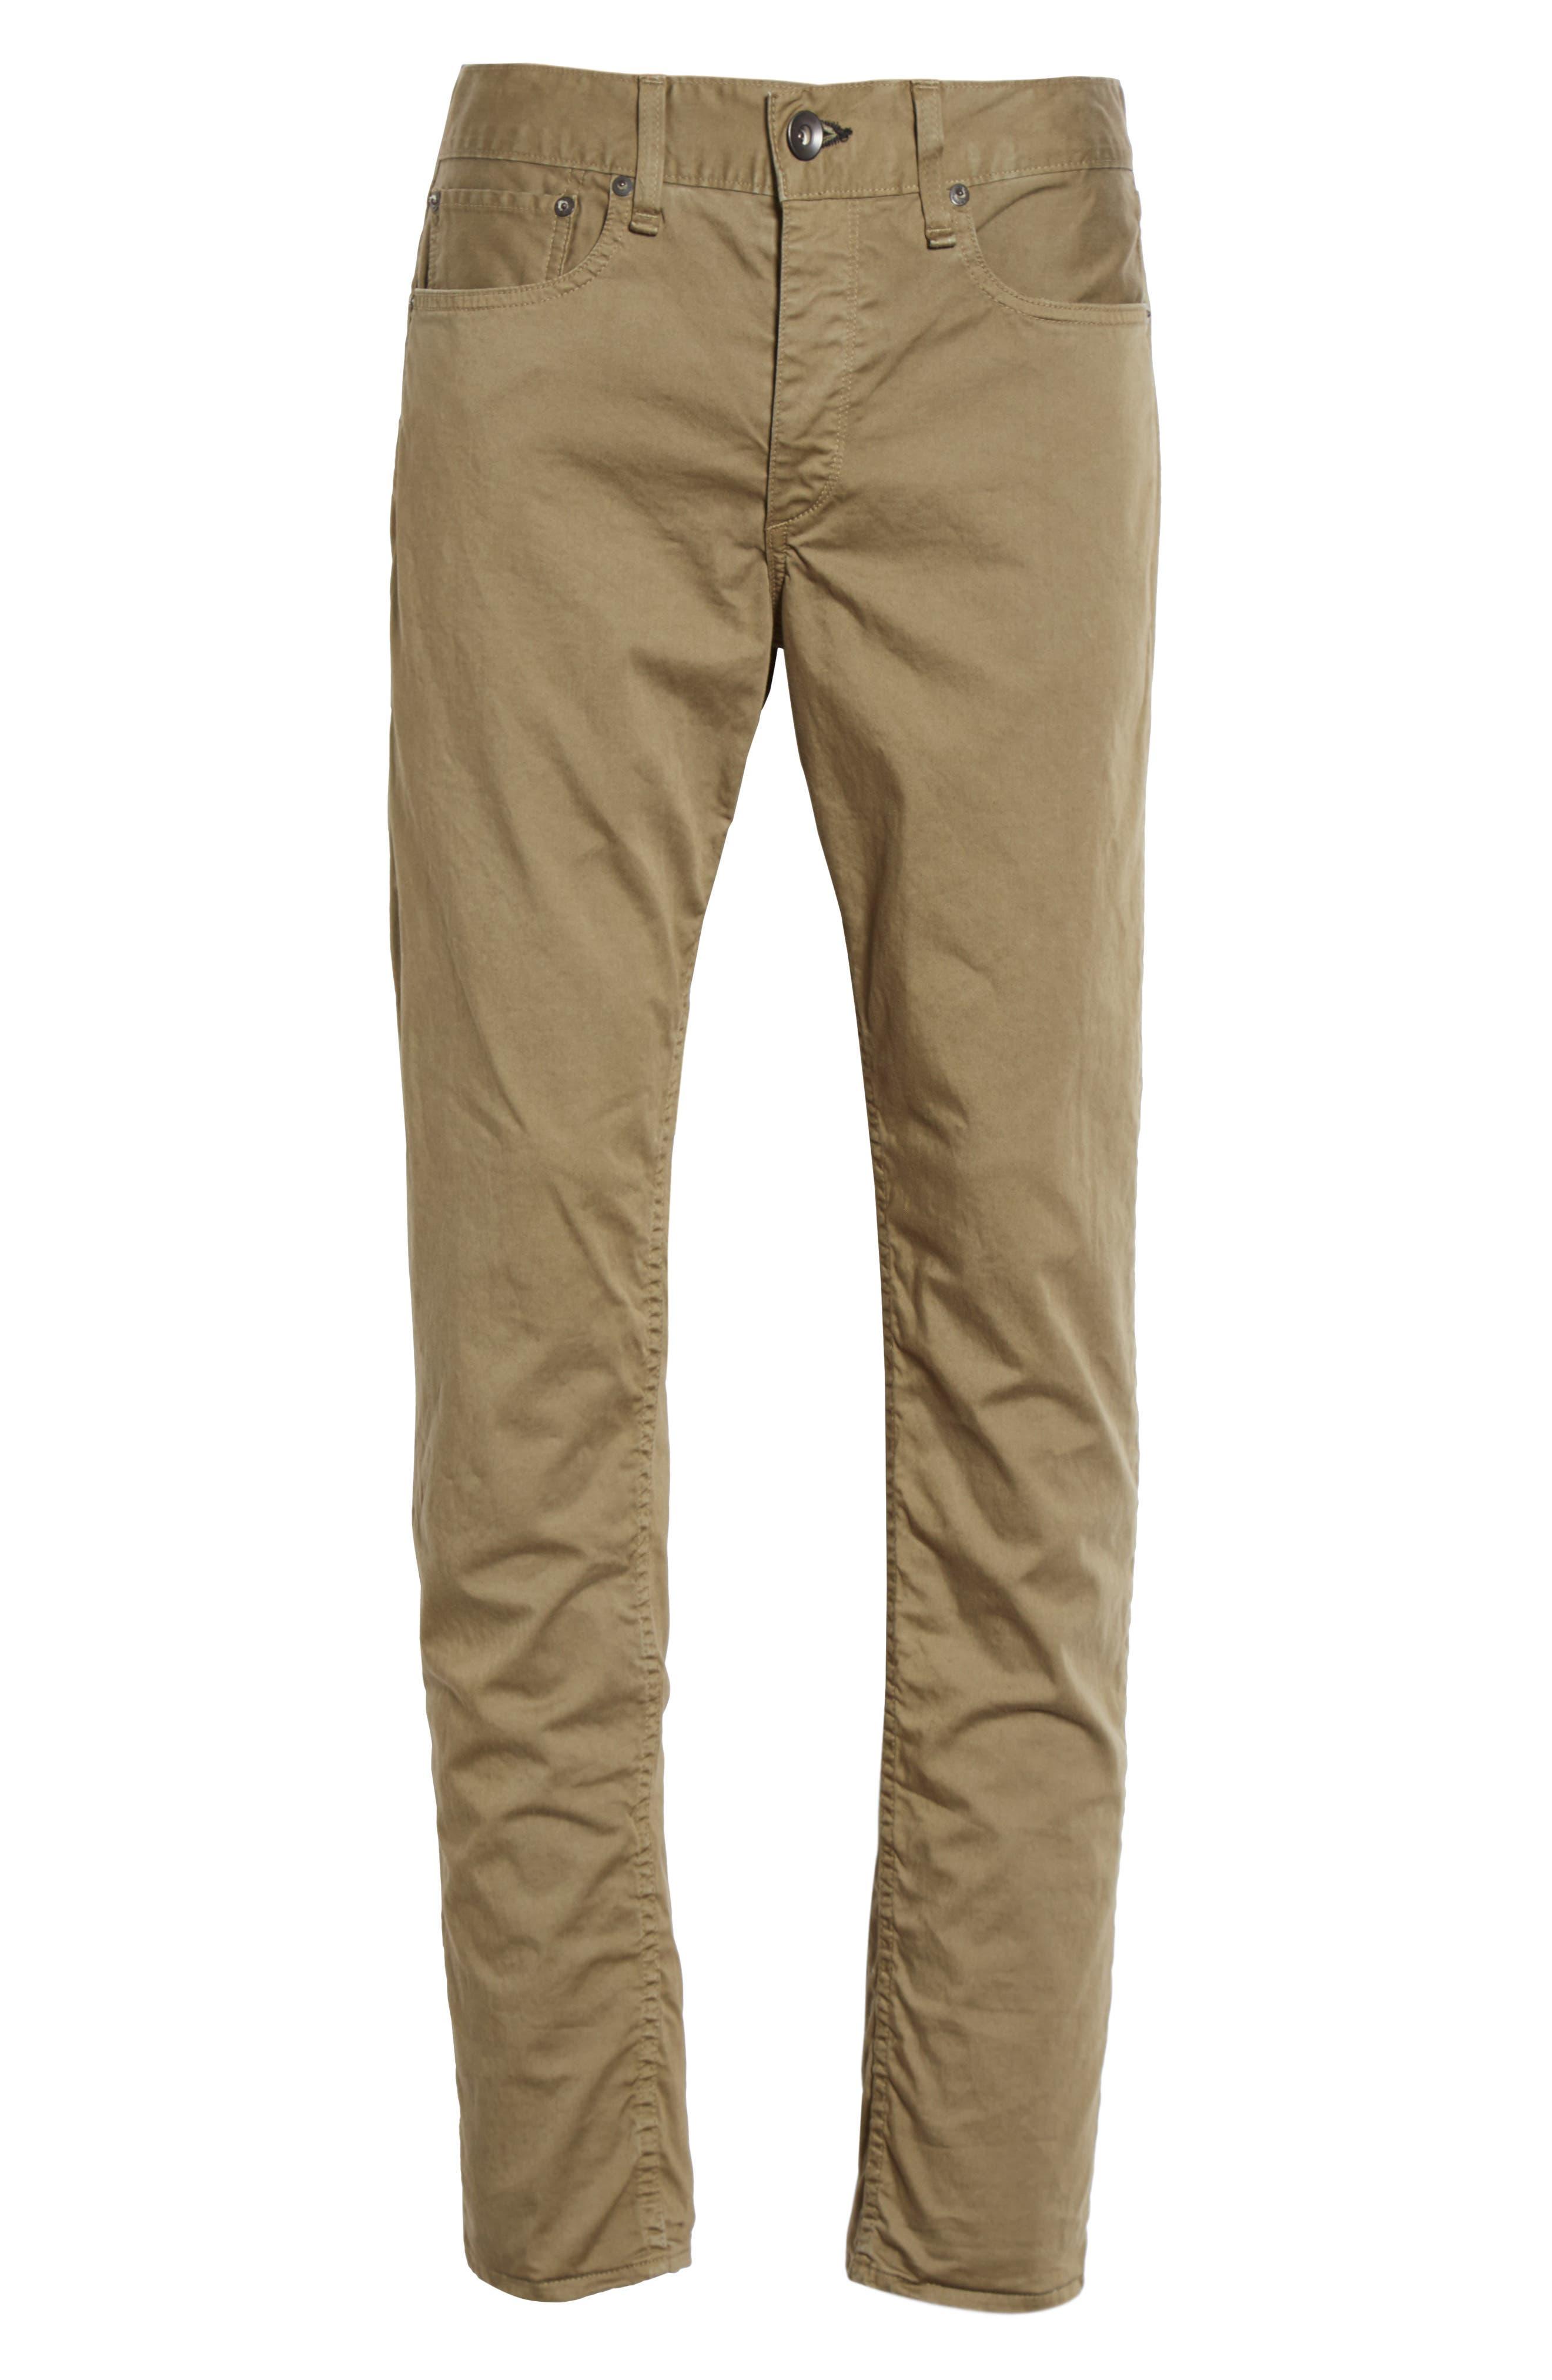 Fit 2 Five-Pocket Twill Pants,                             Alternate thumbnail 6, color,                             319